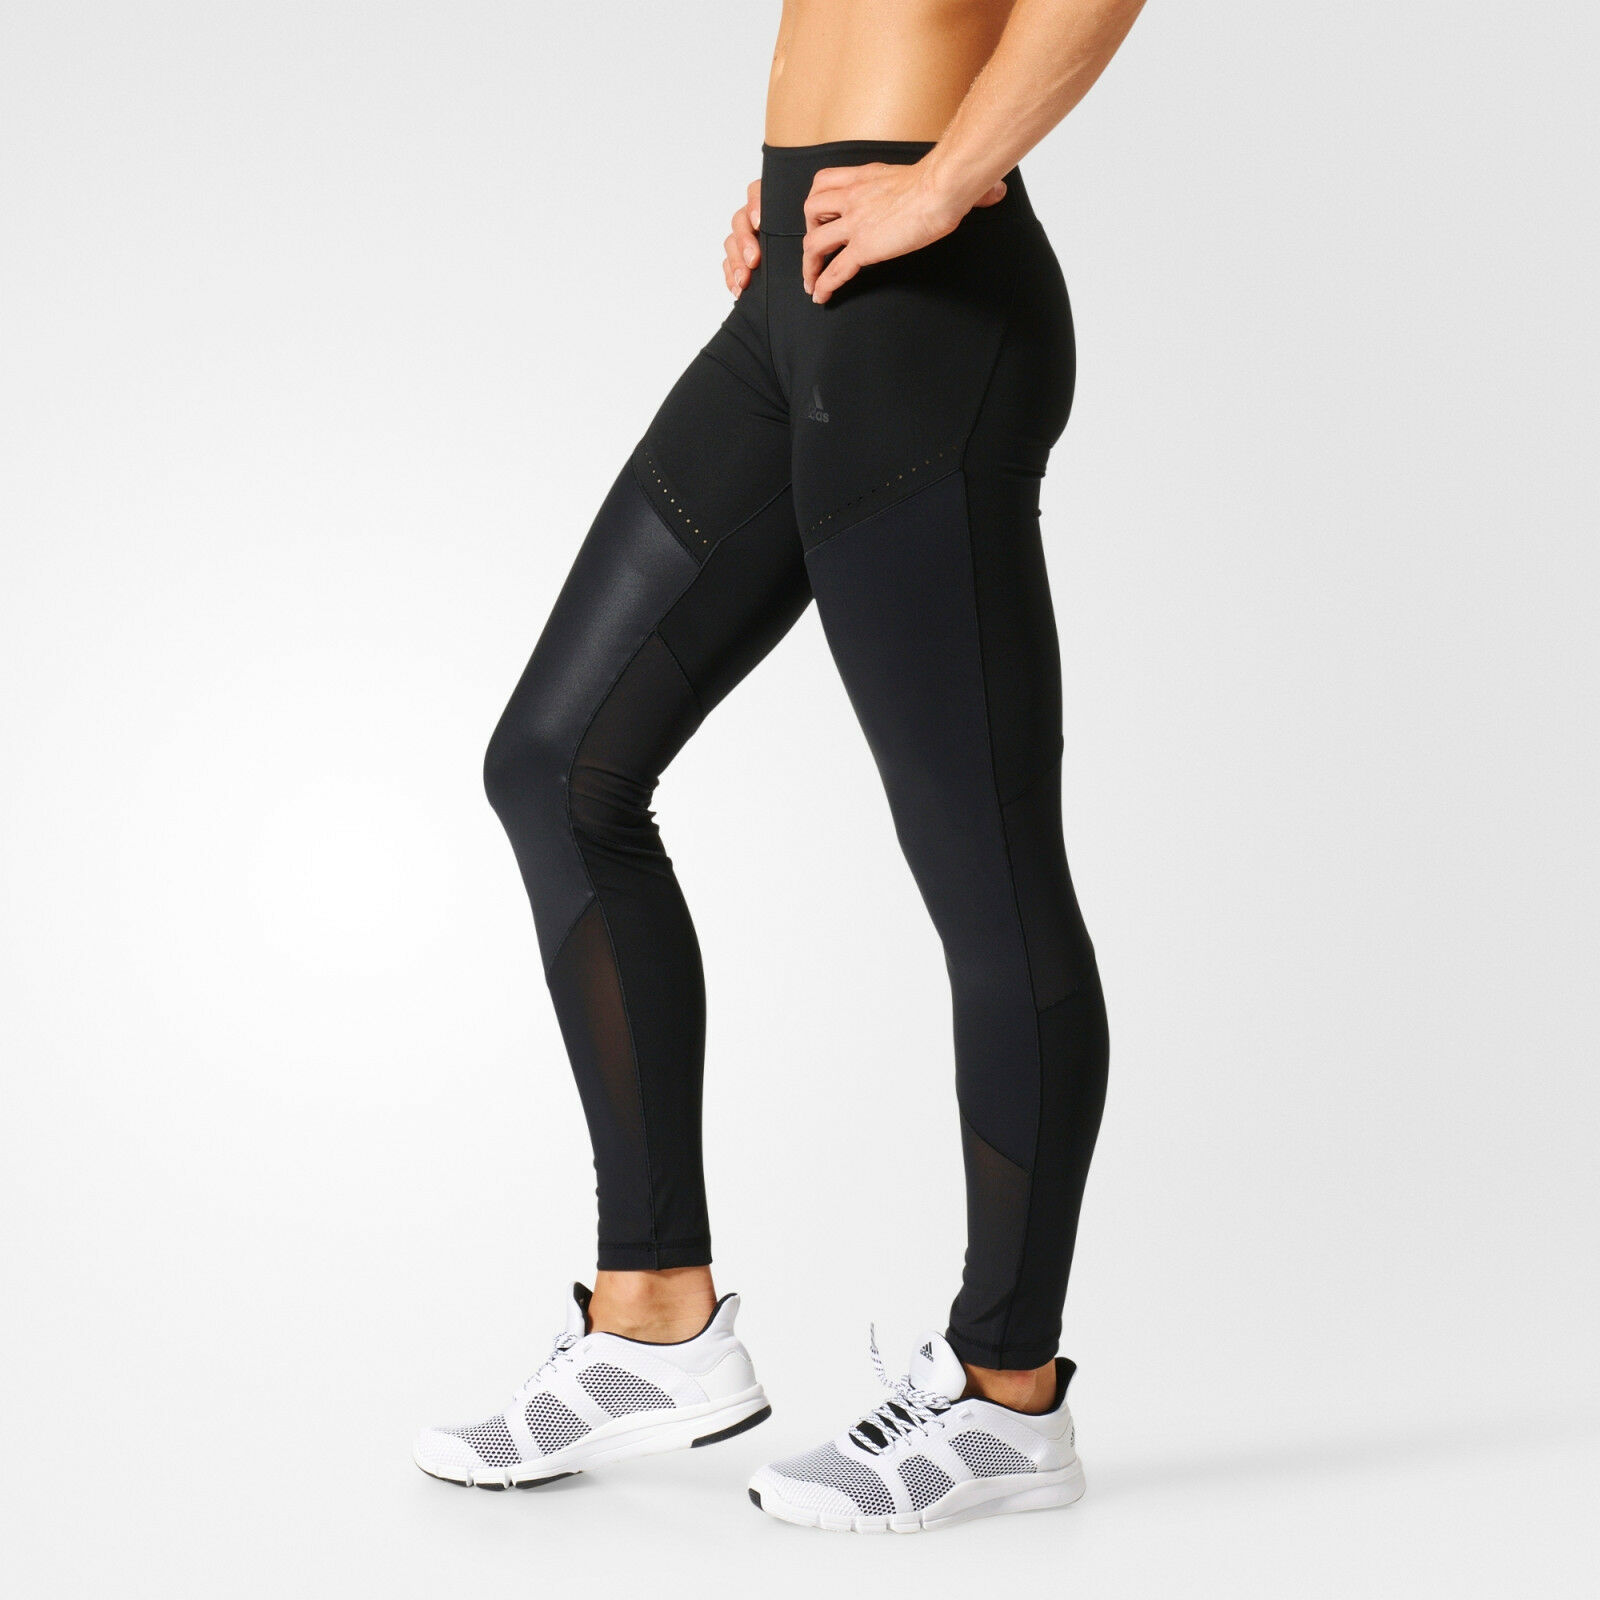 Damen Adidas Schwarze Leggings Adidas Climalite Wow Drop 1 BQ2126 NEU